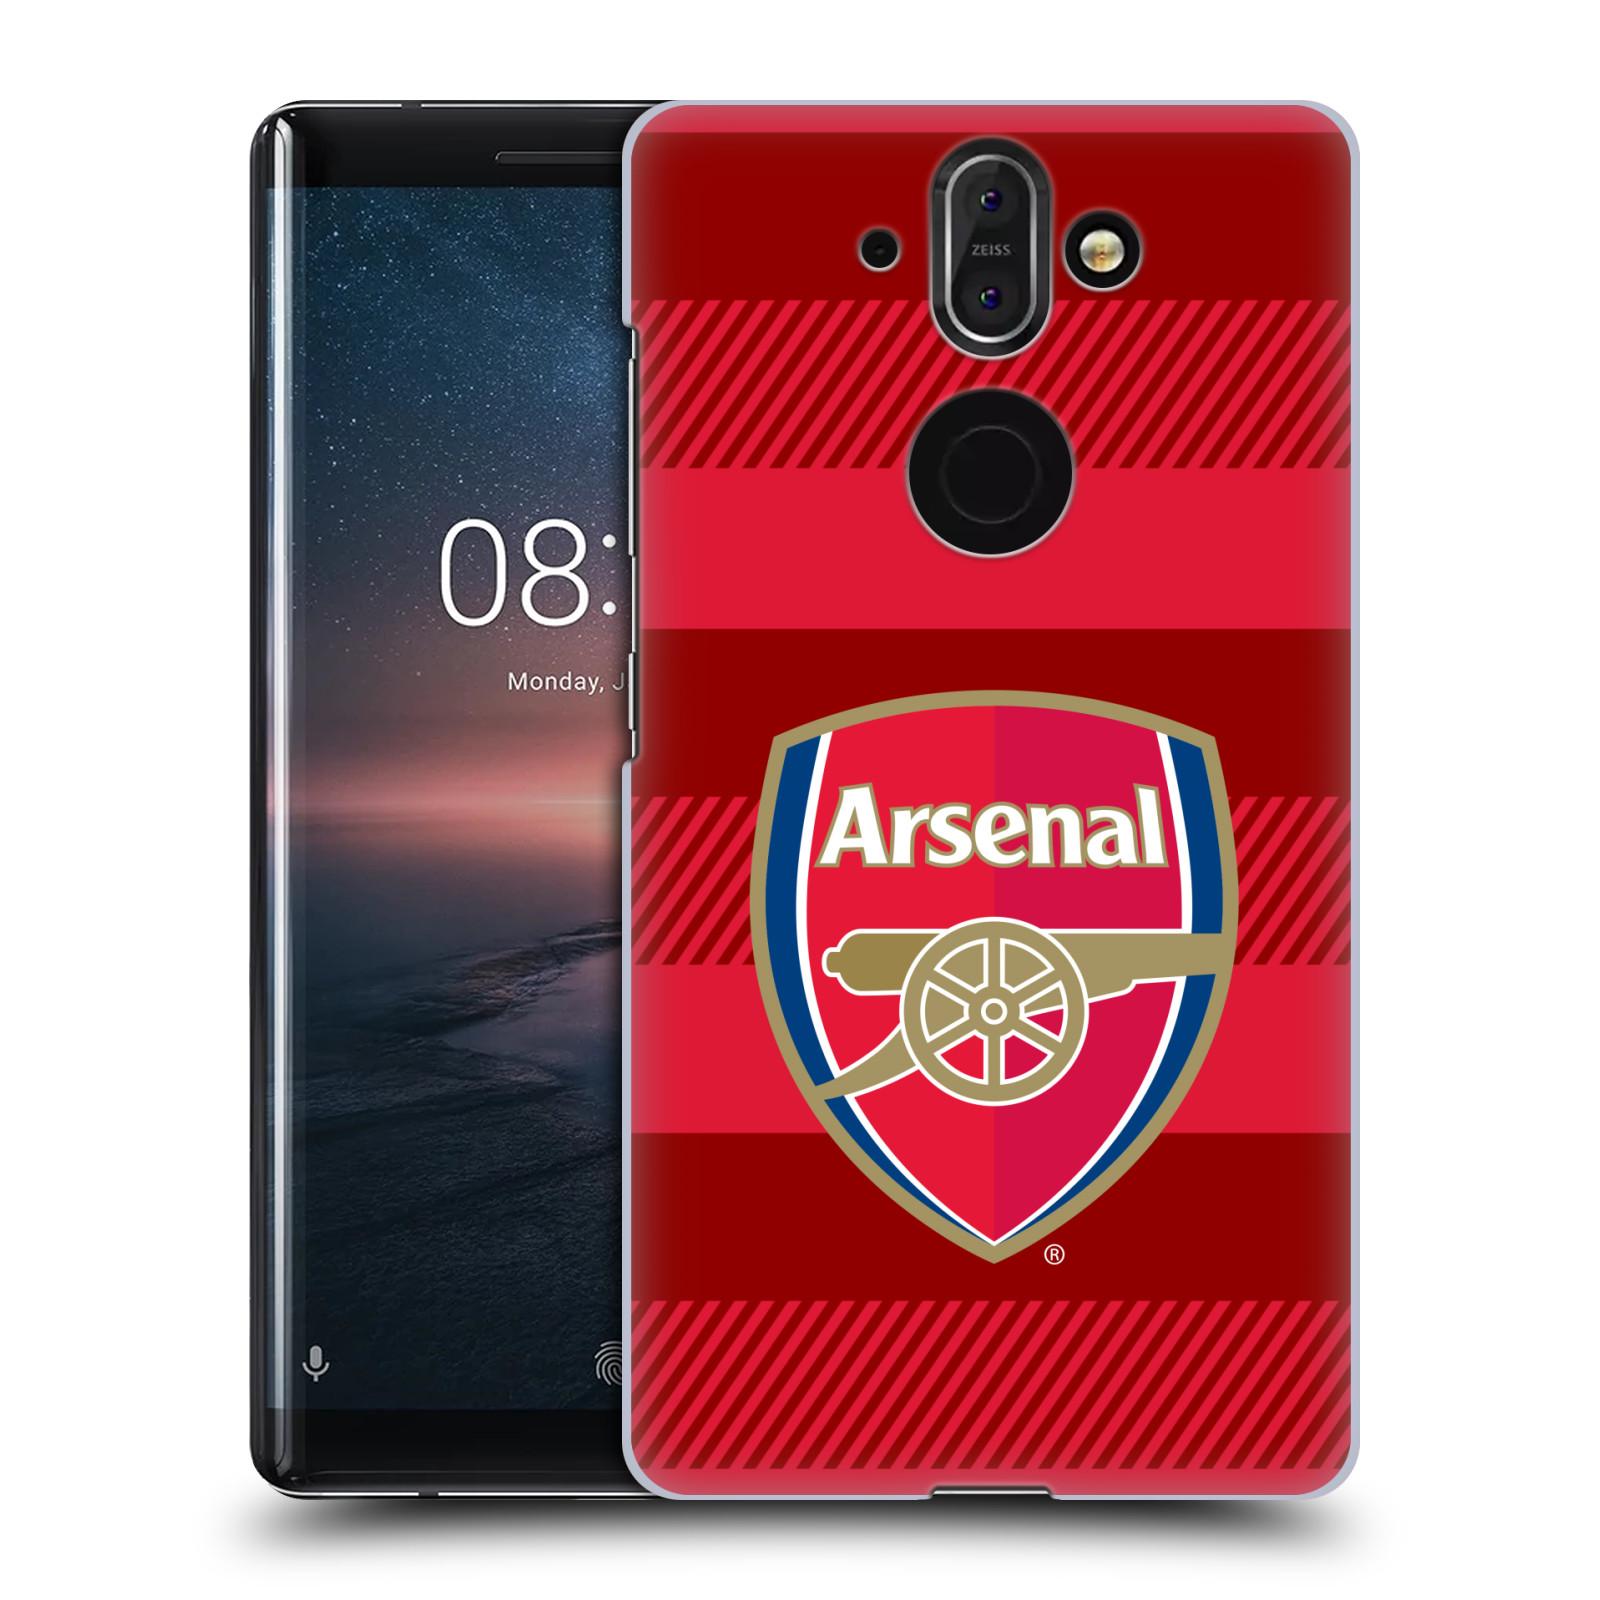 Plastové pouzdro na mobil Nokia 8 Sirocco - Head Case - Arsenal FC - Logo s pruhy